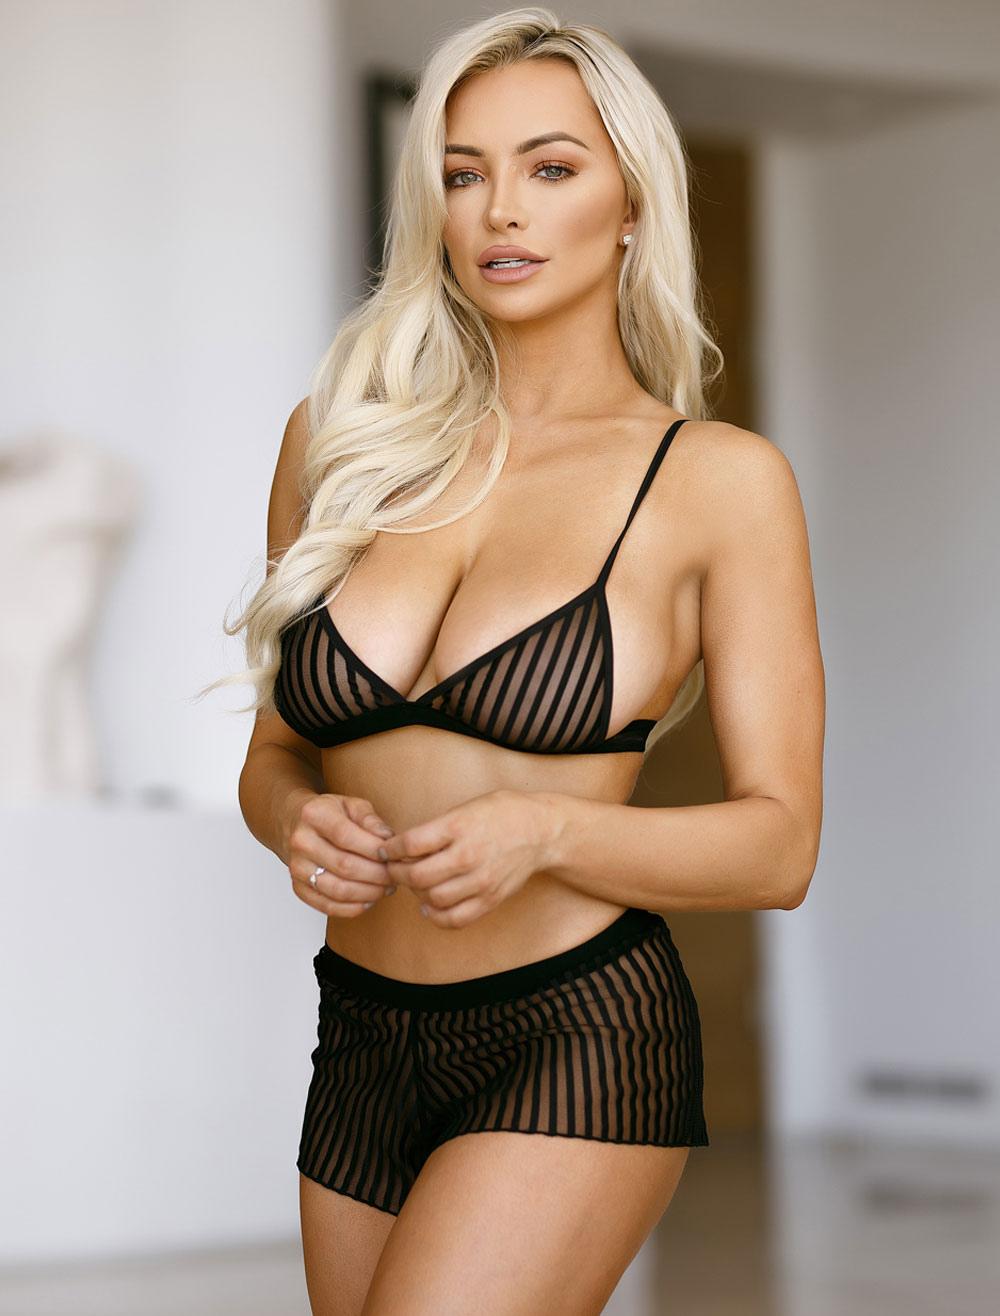 f30029788 Black Bra Set Striped Nylon Sexy Lingerie 2 Piece For Women ...